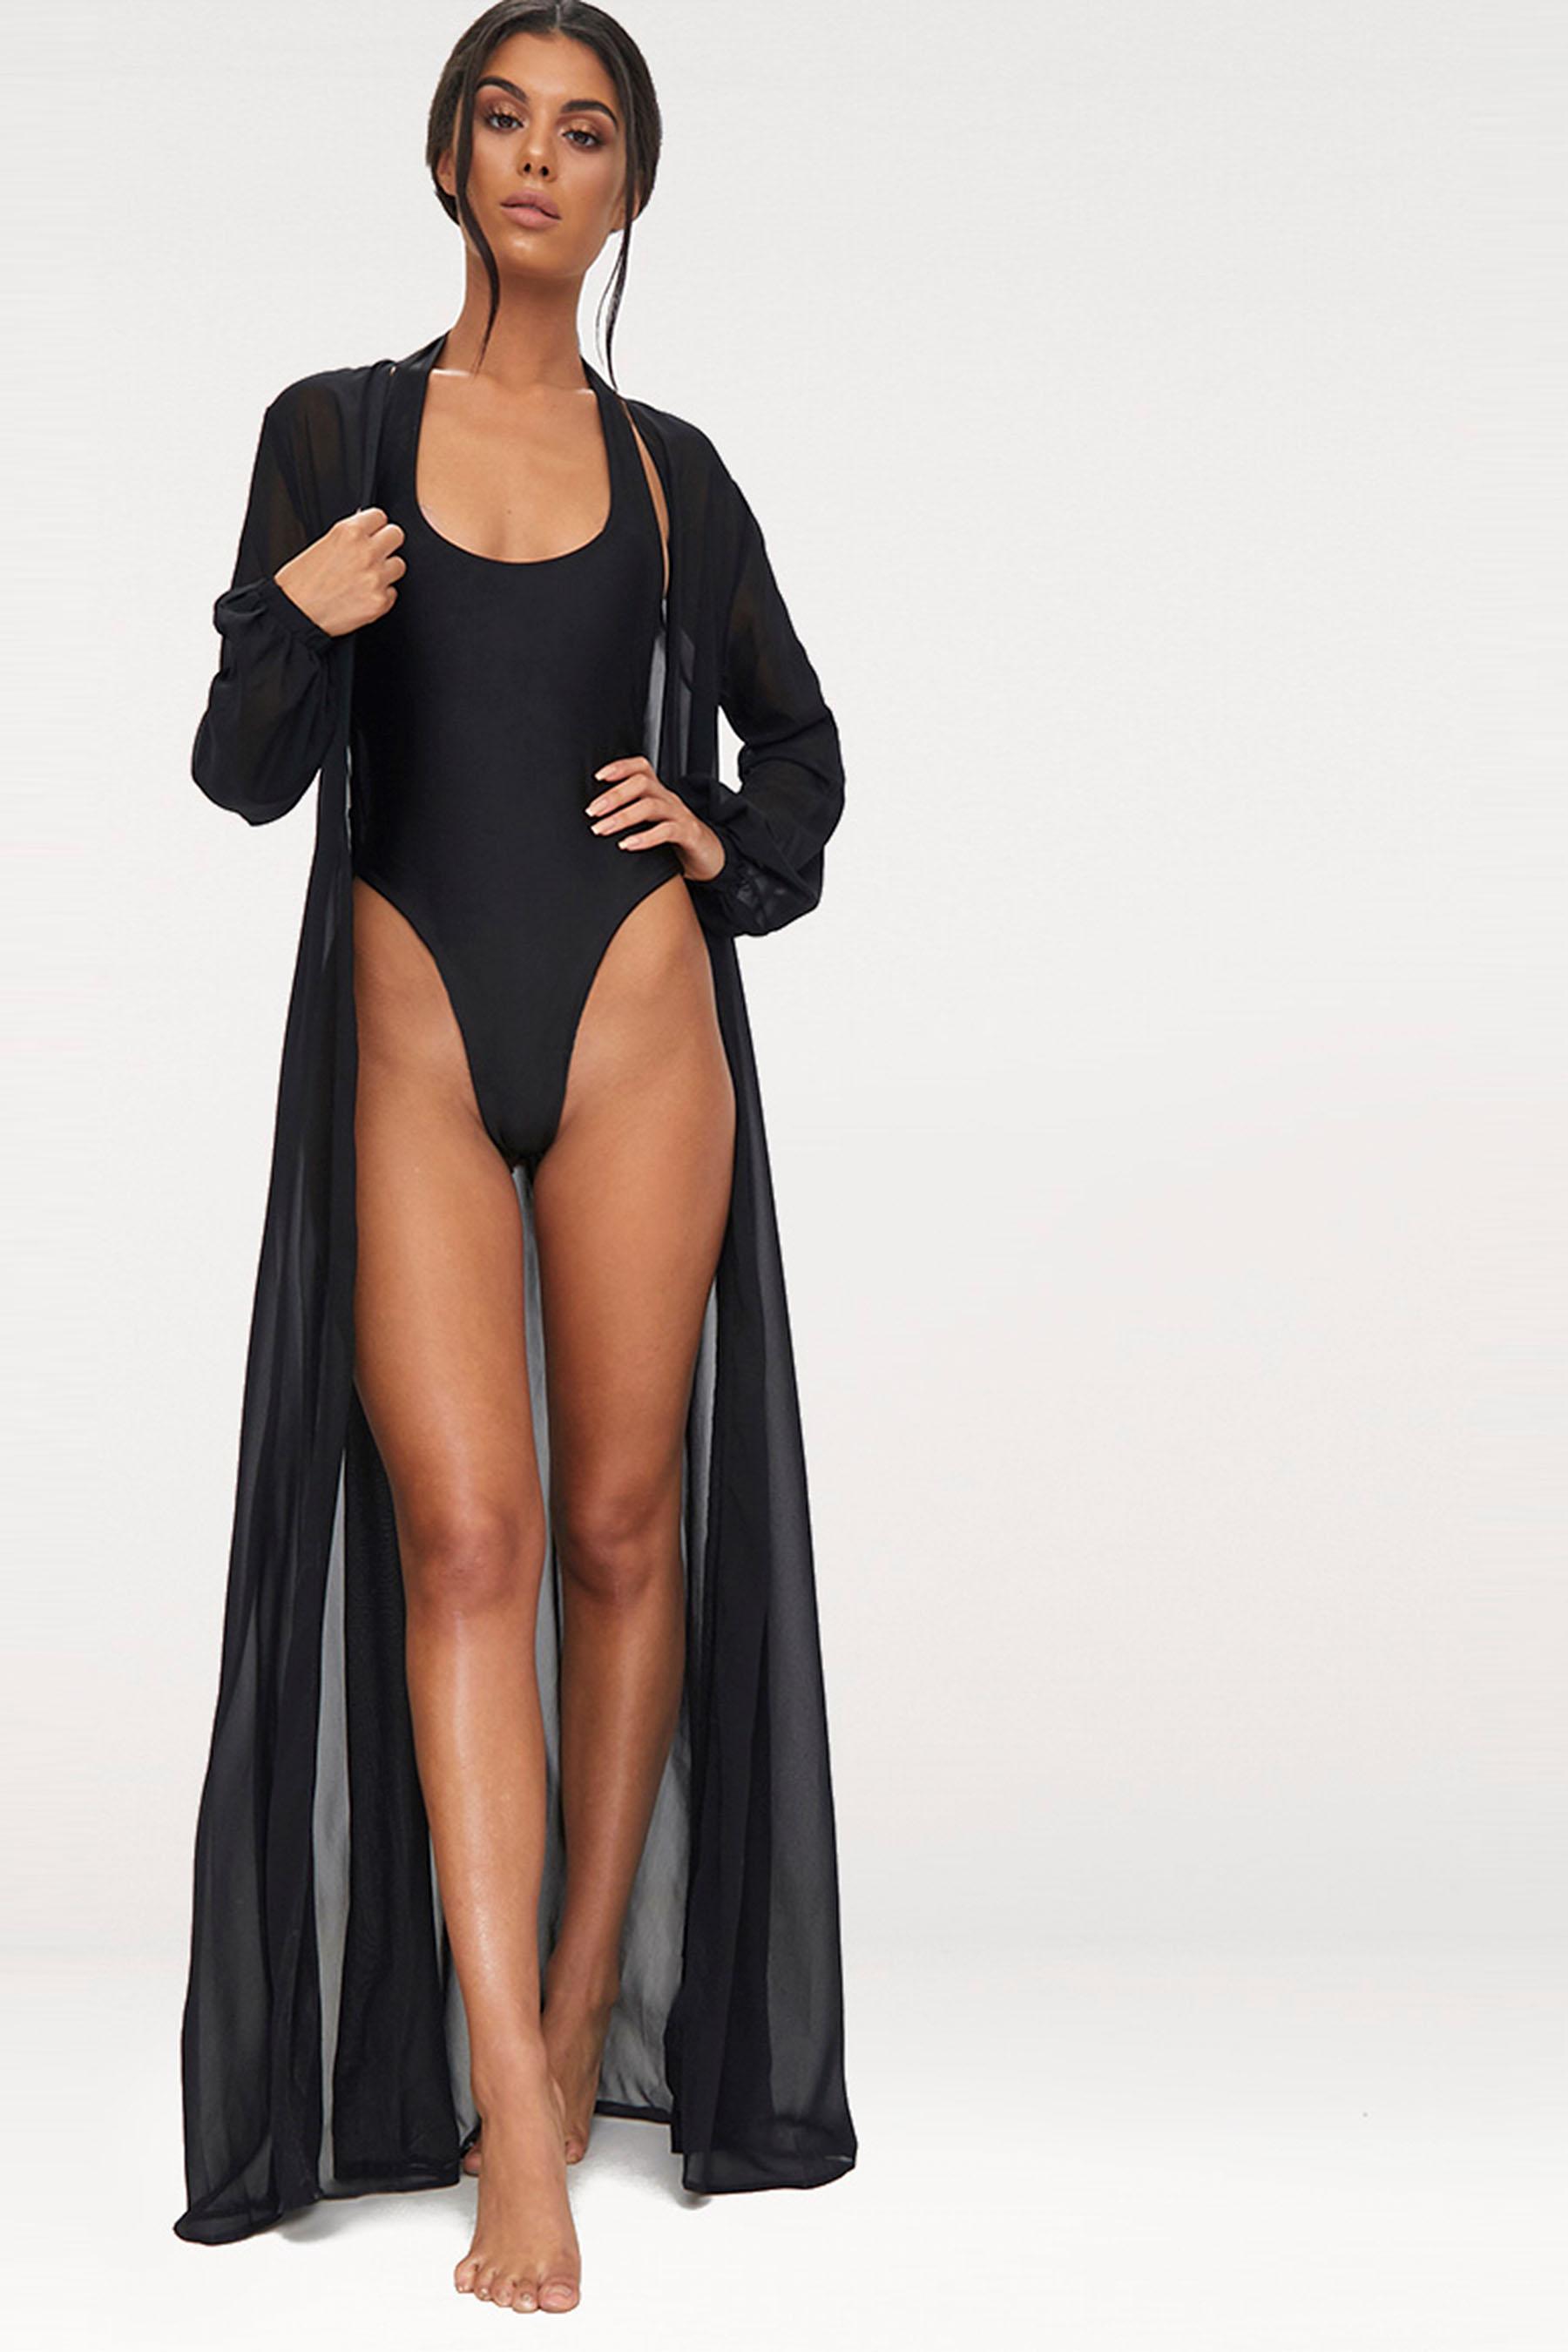 58796ac7e0 Womens PrettyLittleThing Alice Maxi Belted Beach Kimono - Black ...